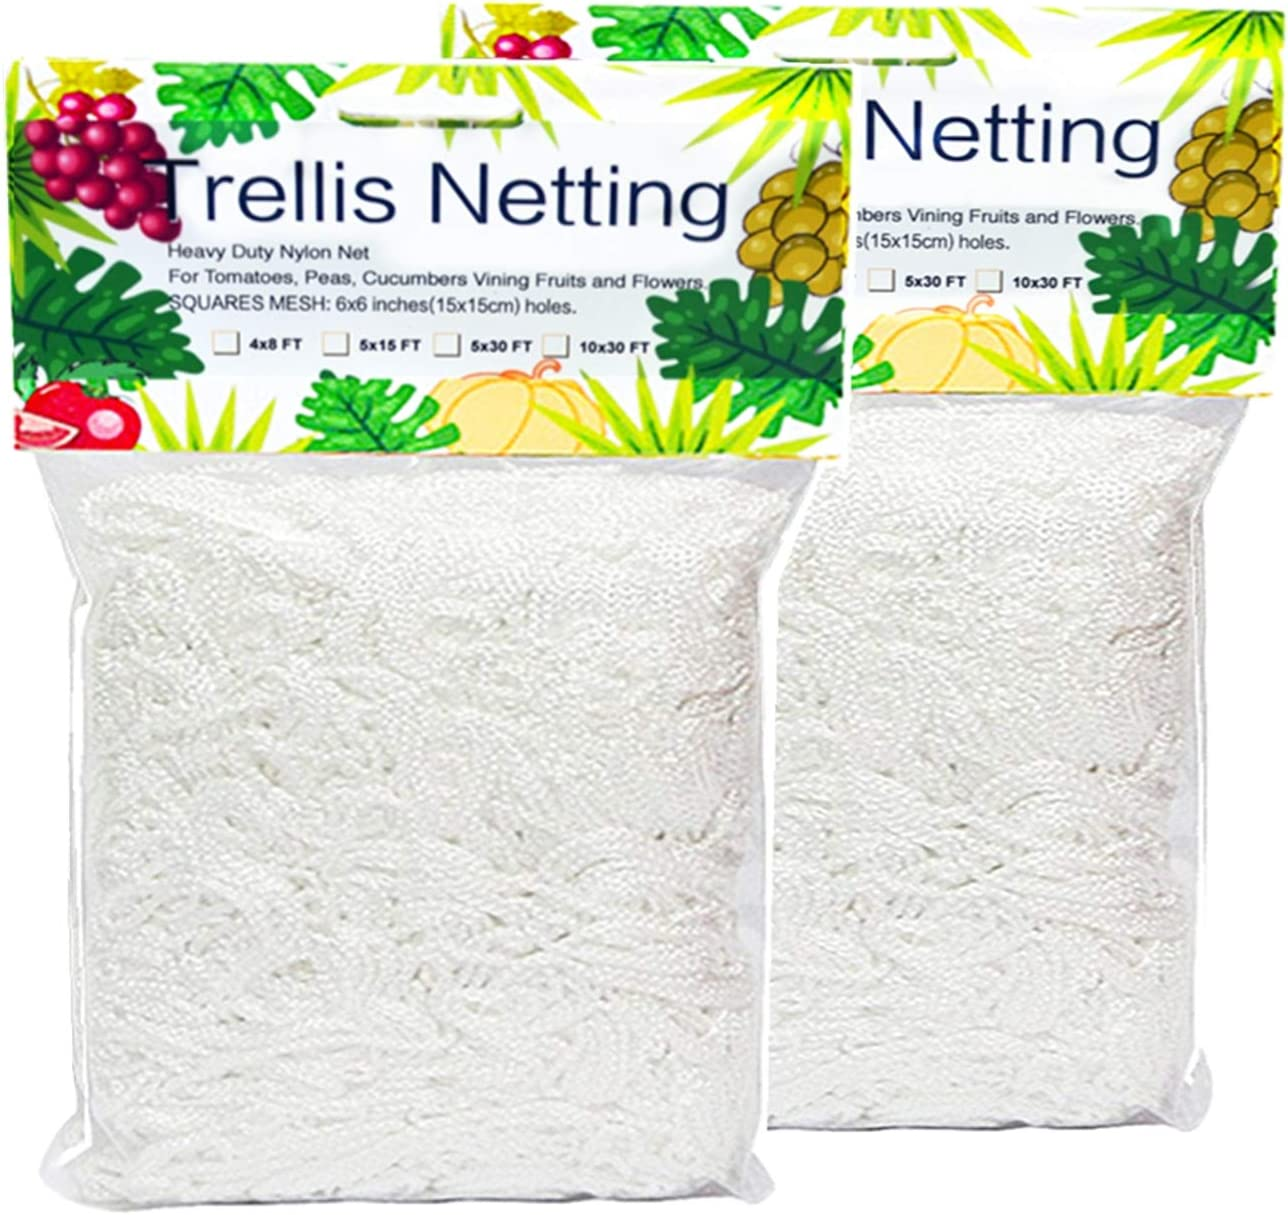 Trellis Netting, Heavy-Duty 5 x 15ft Polyester Plant Trellis Netting Support for Climbing Vining Plants, 2 Pack